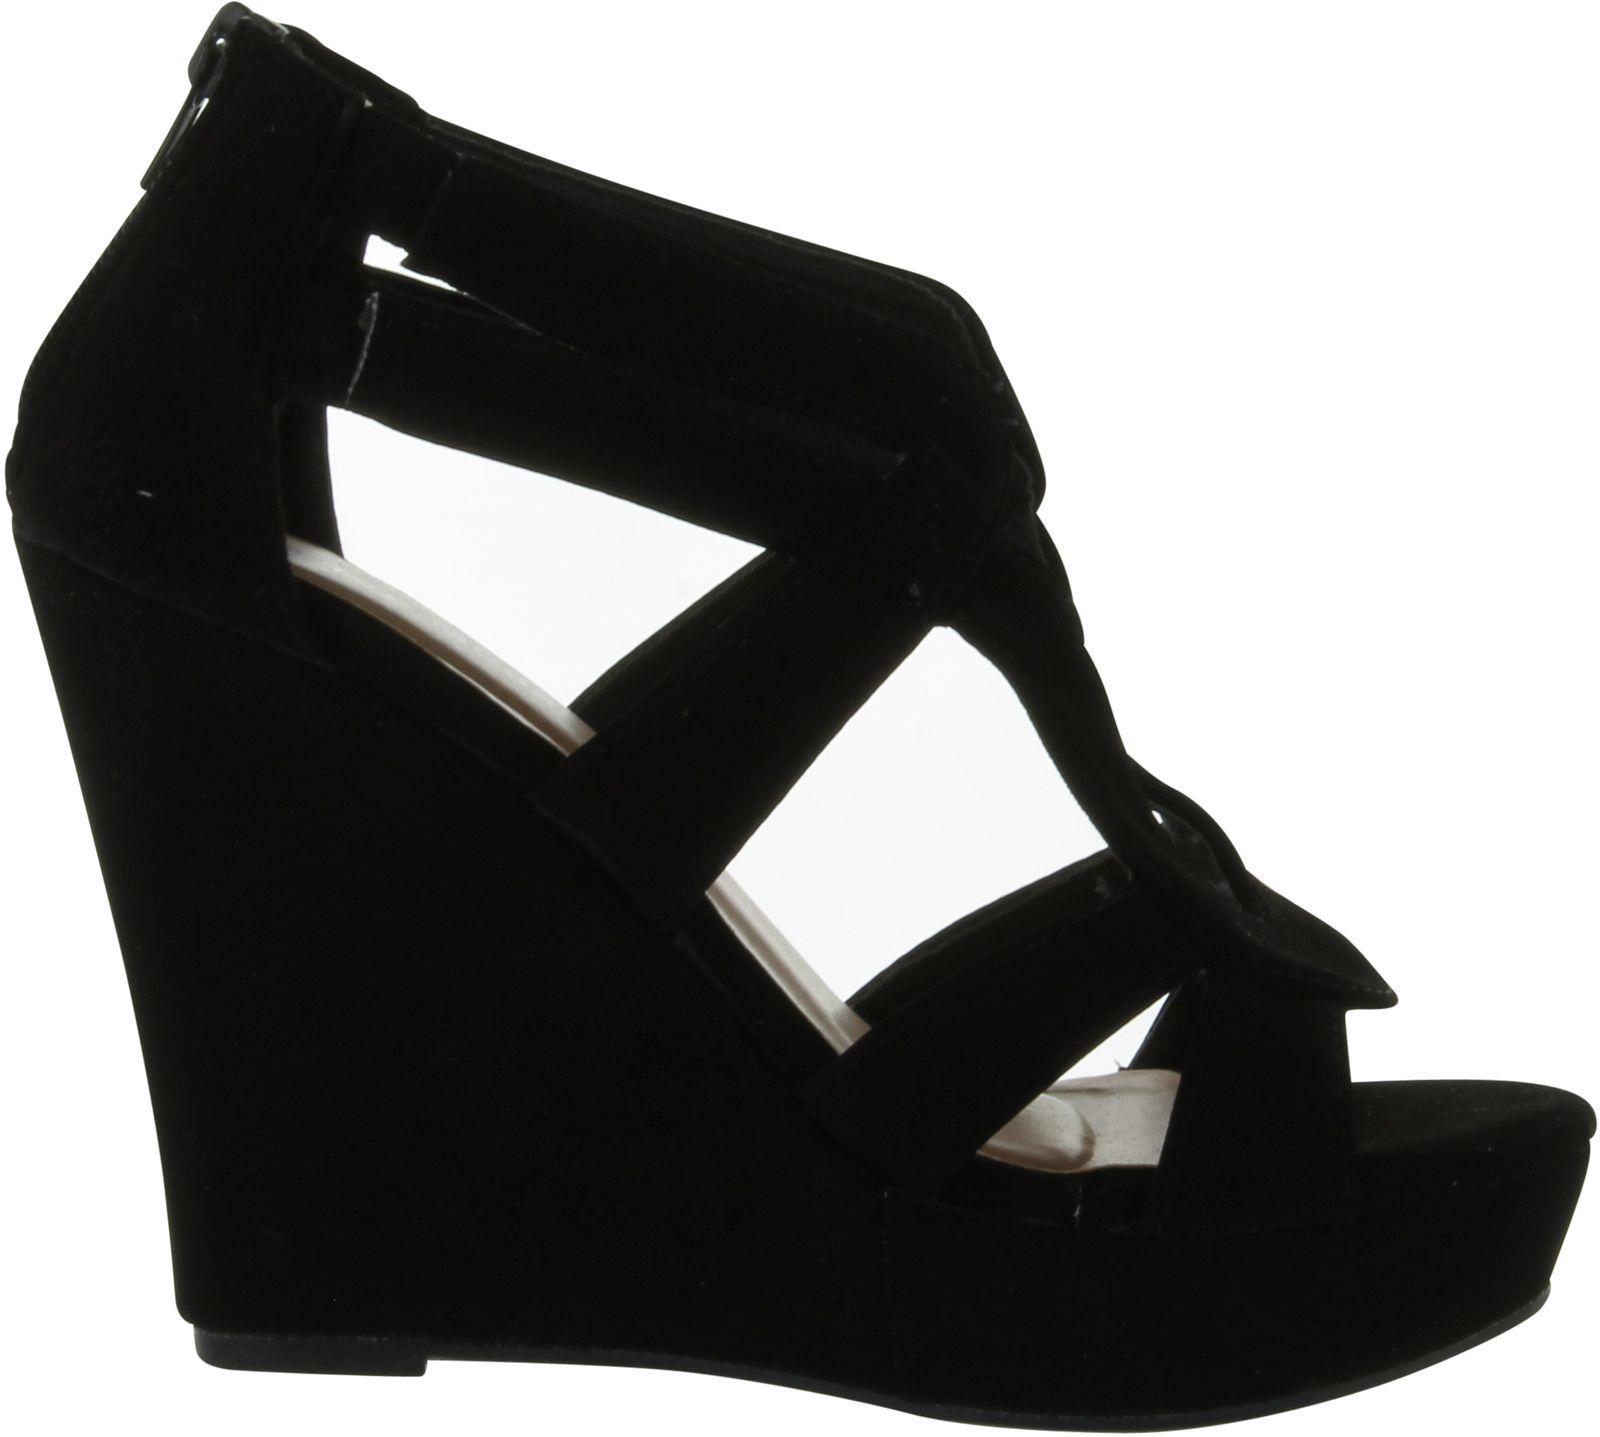 0d0c0ebbe8c7 Top Moda Womens Lindy-3 Wedge Sandals 9 B(m) US Black for sale ...